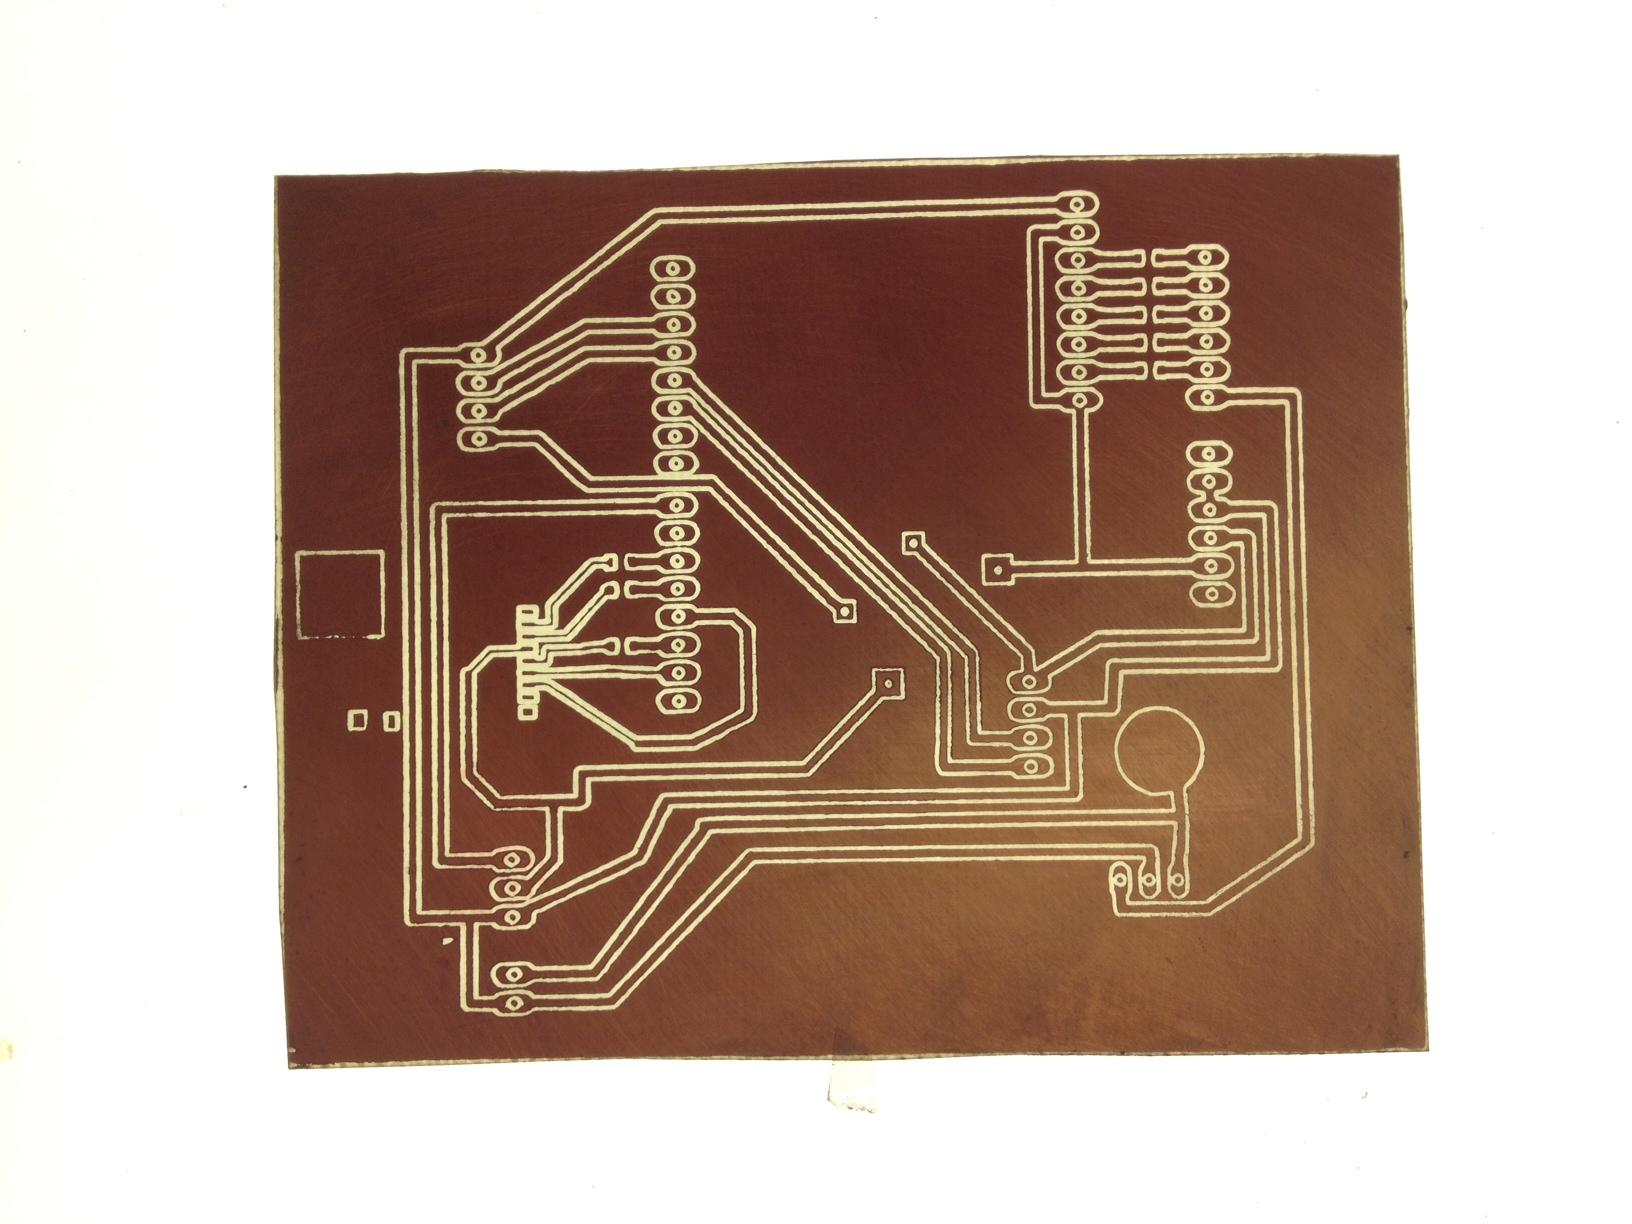 BADASS PCB